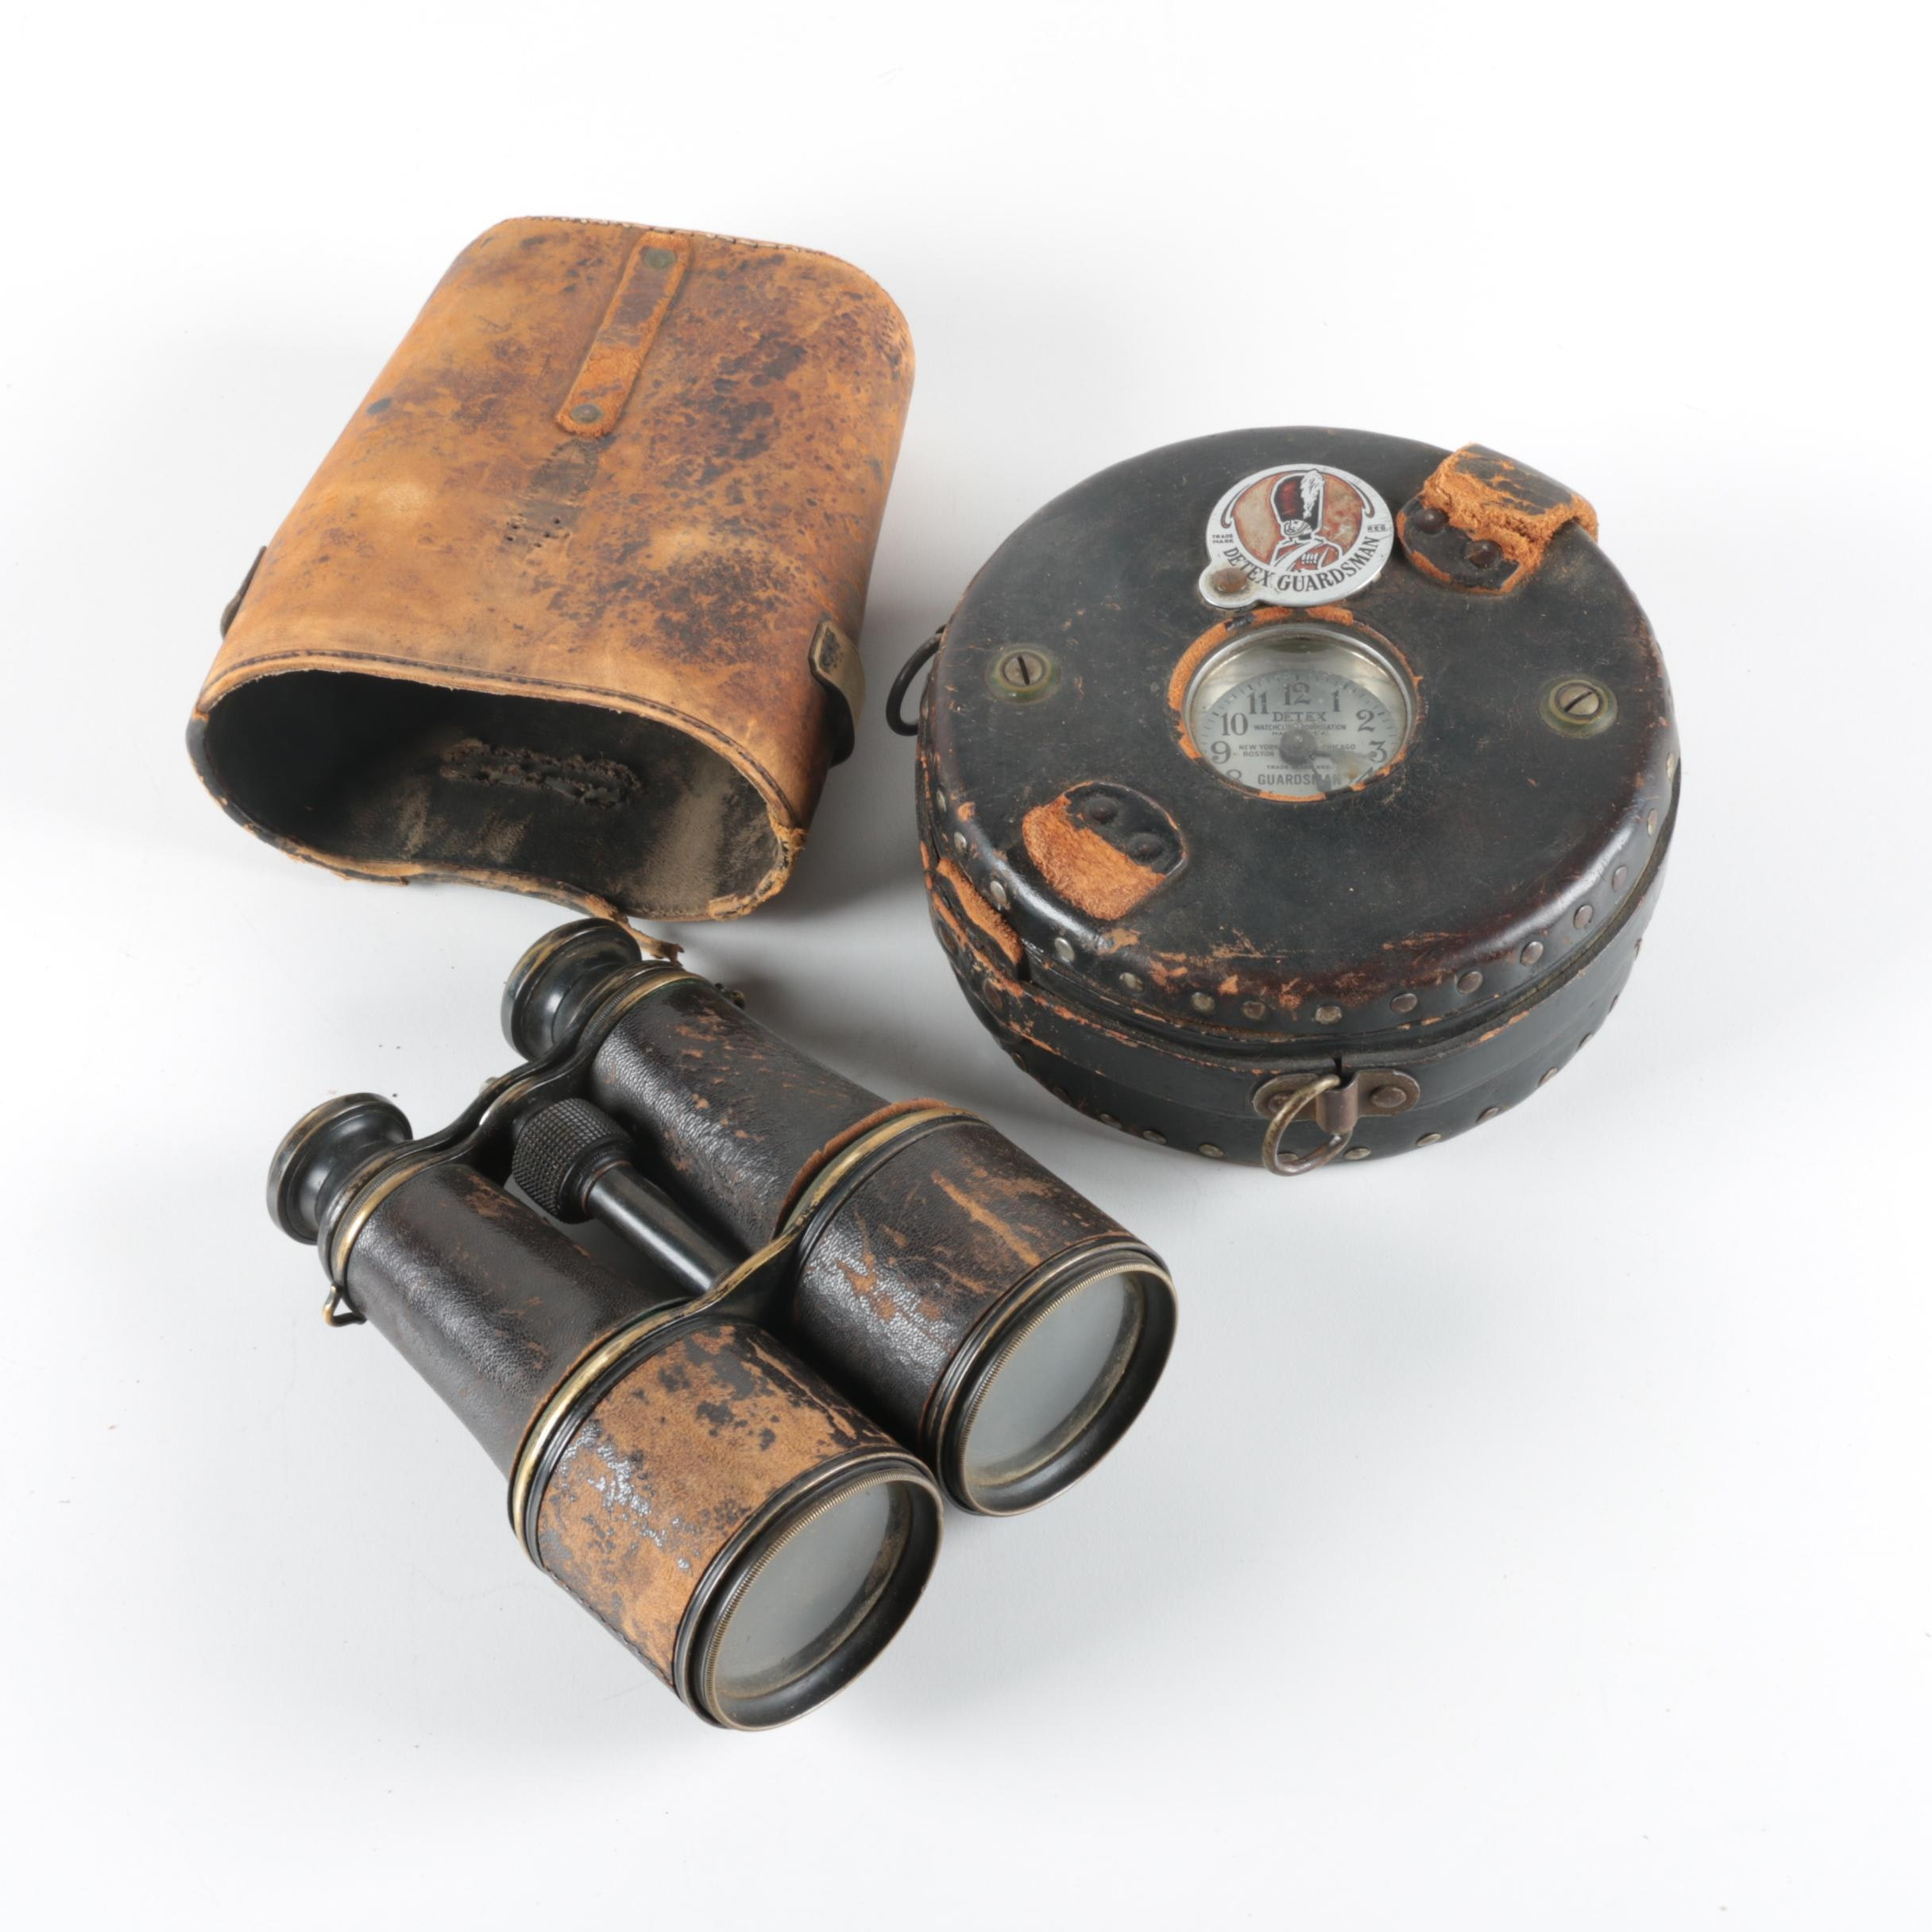 Detex Guardsman Watchclock and Binoculars